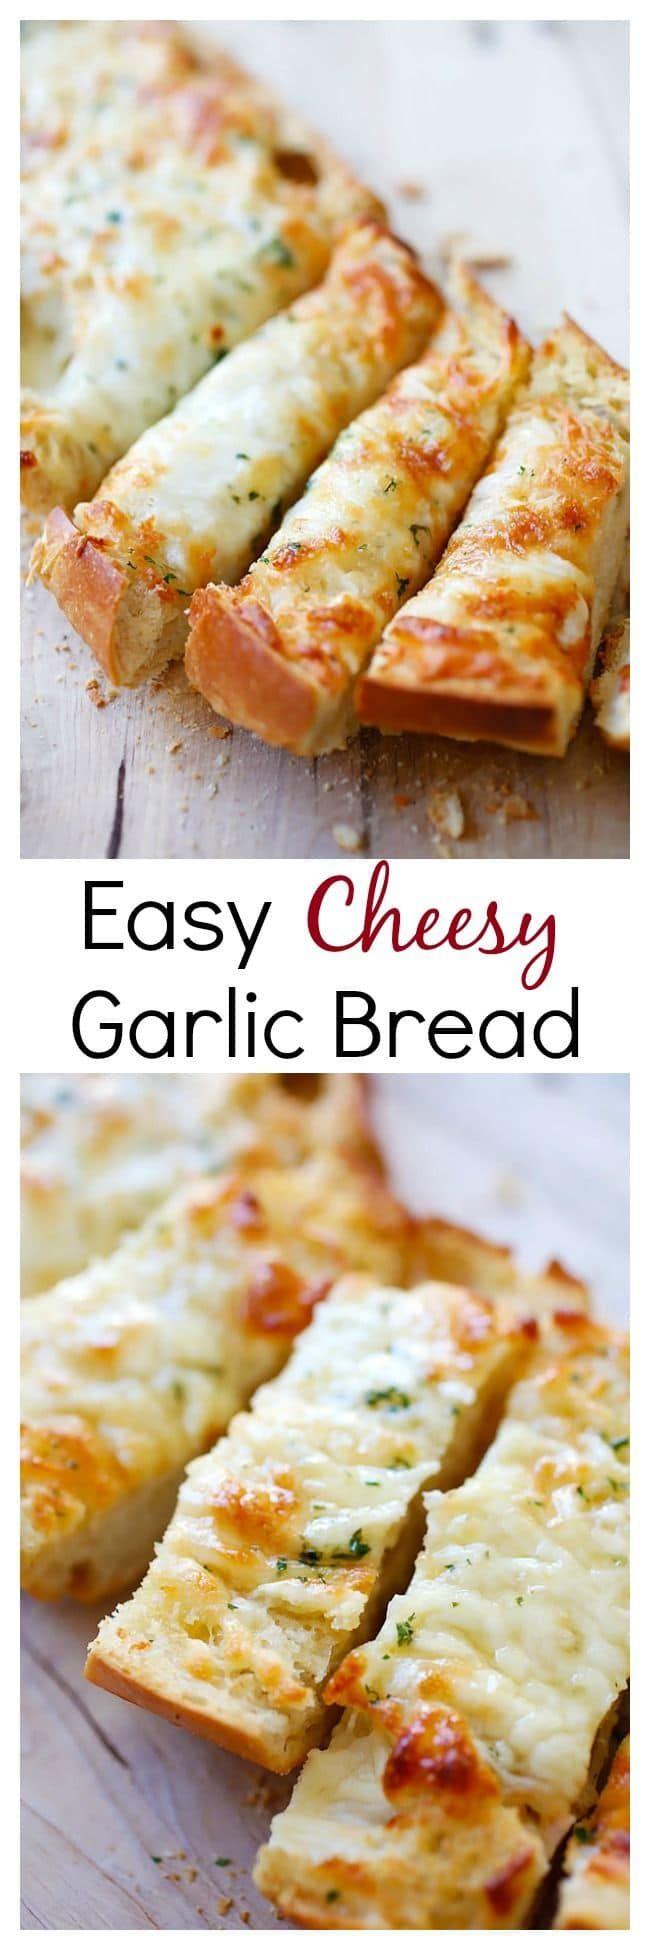 Easy Cheesy Garlic Bread – Turn regular Italian bread into buttery & cheesy garlic bread with this super easy recipe that takes only 20 mins   http://rasamalaysia.com